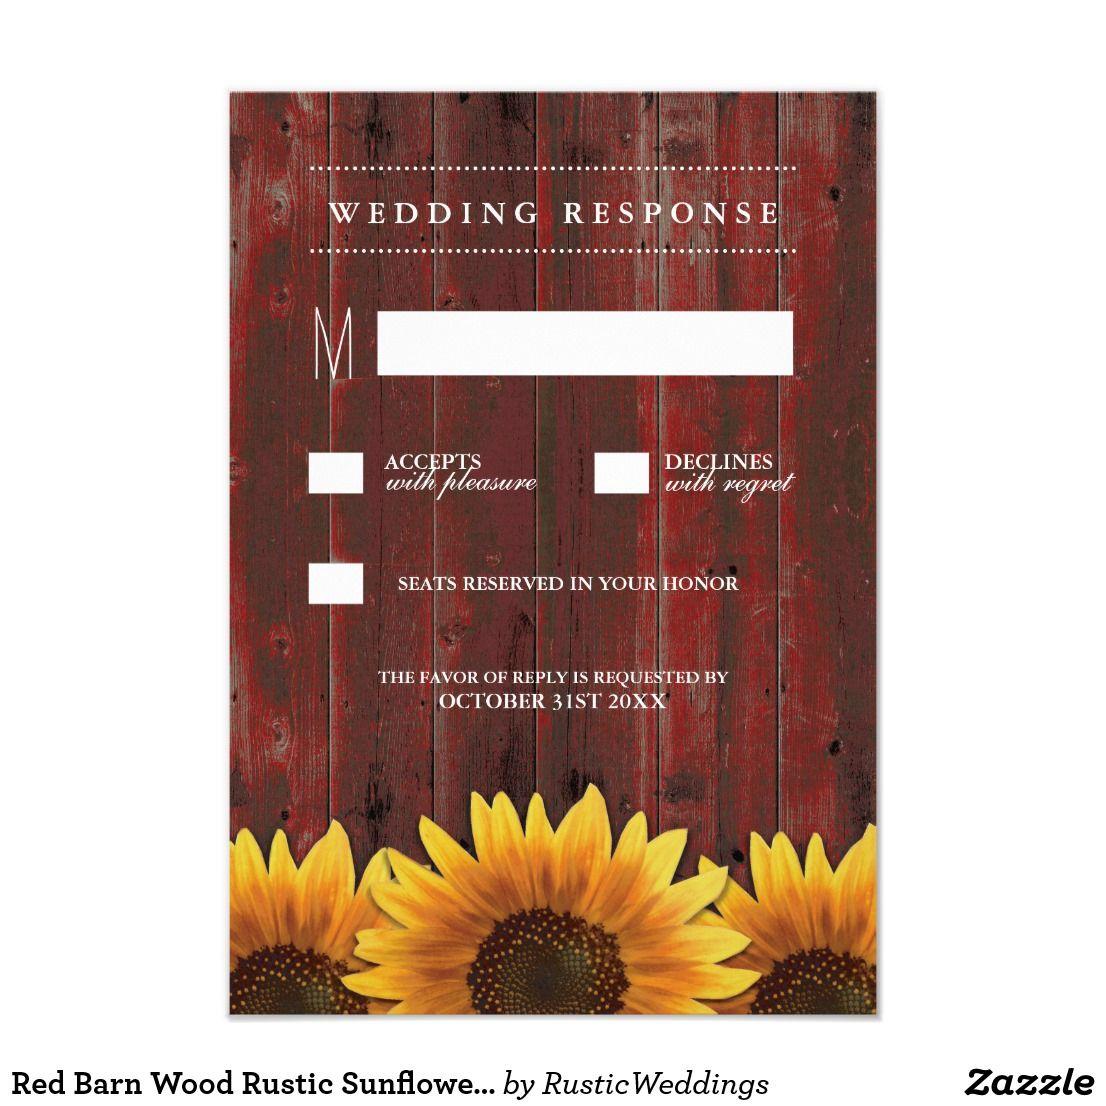 Red Barn Wood Rustic Sunflower Wedding RSVP Cards Zazzle